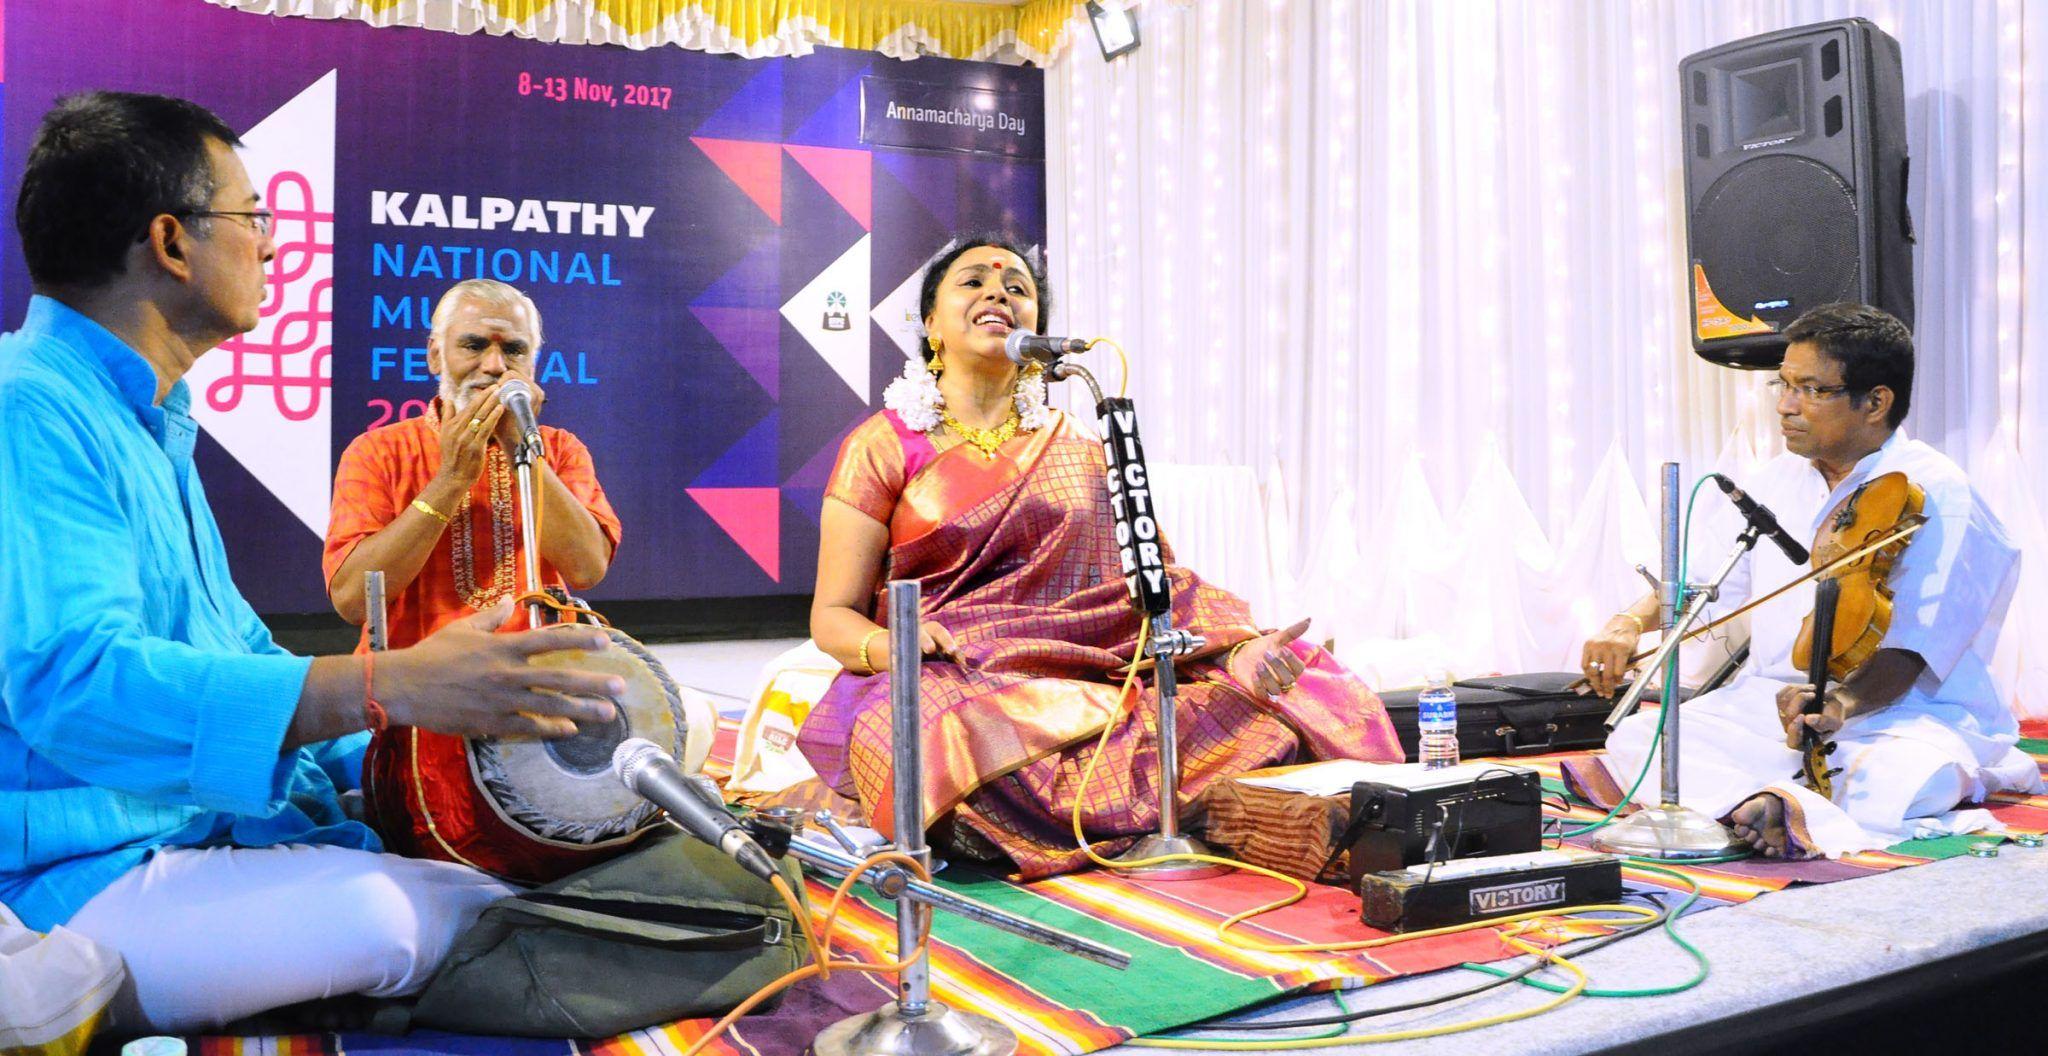 Kalapathy National Music Festival